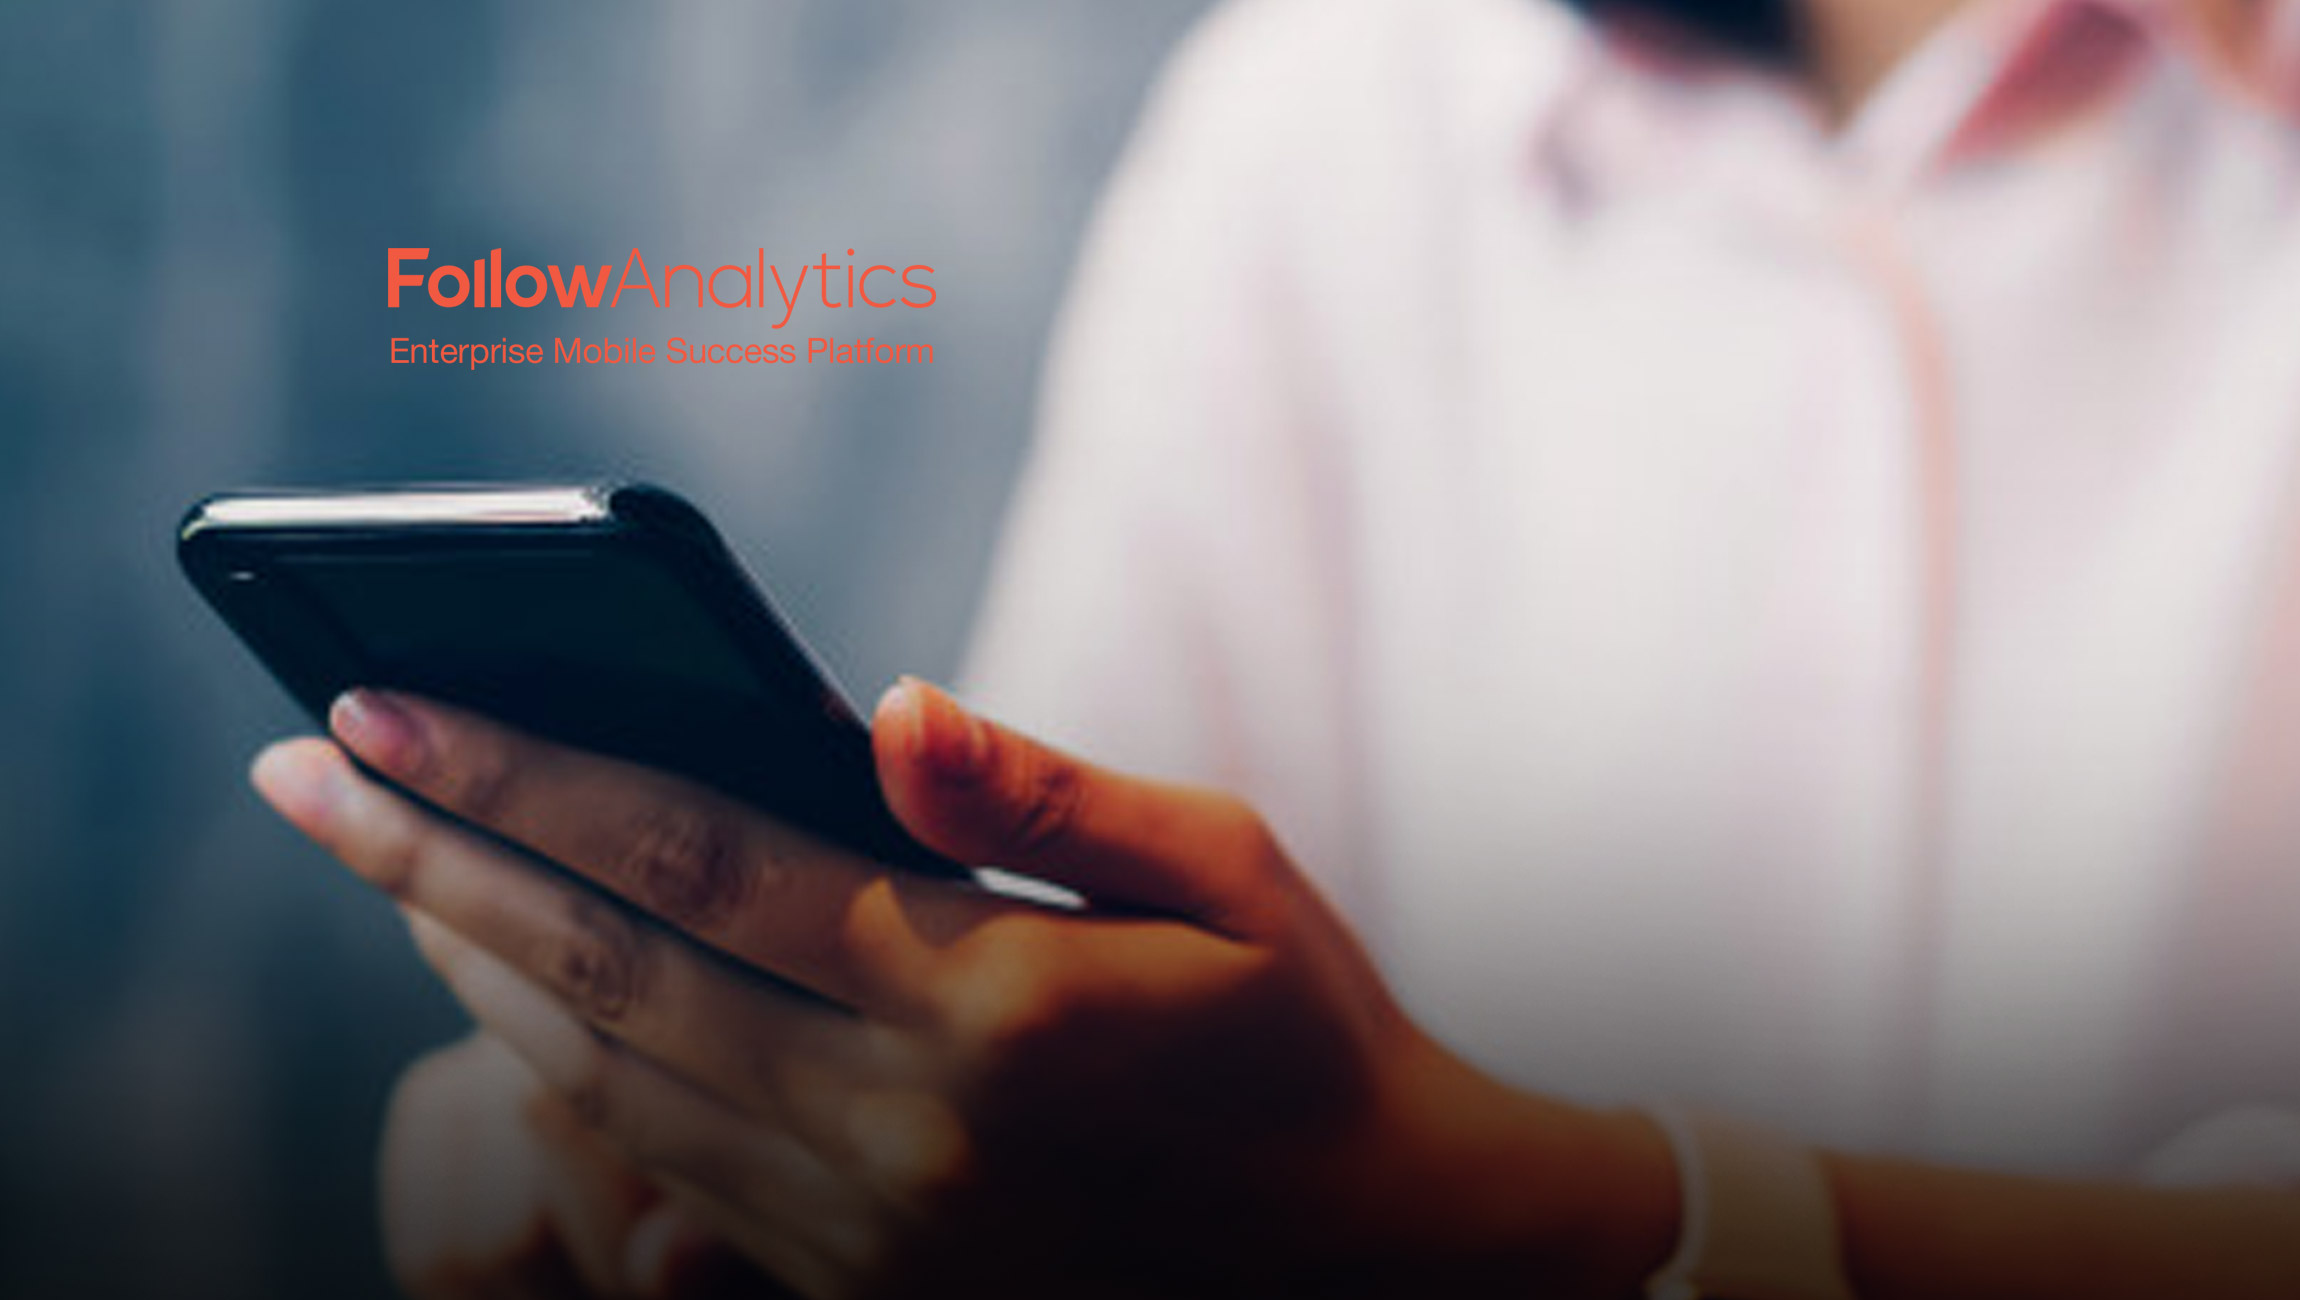 FollowAnalytics Brings No-Code Mobile Apps to Magento Merchants